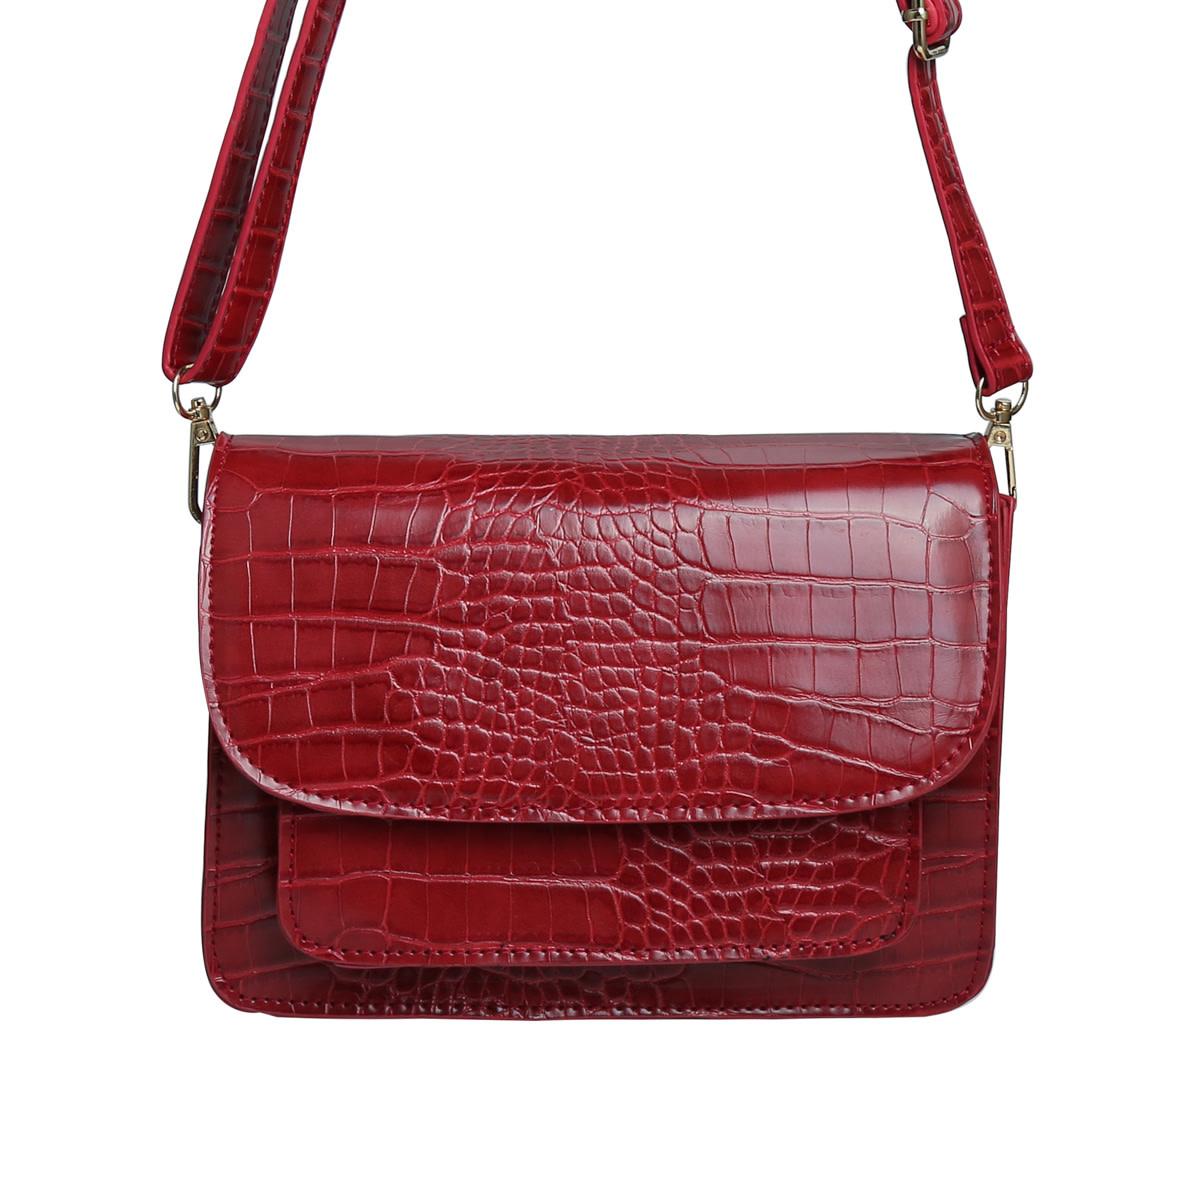 With love Bag Vogue - burgundy 21cm x 13.50cm x 7cm